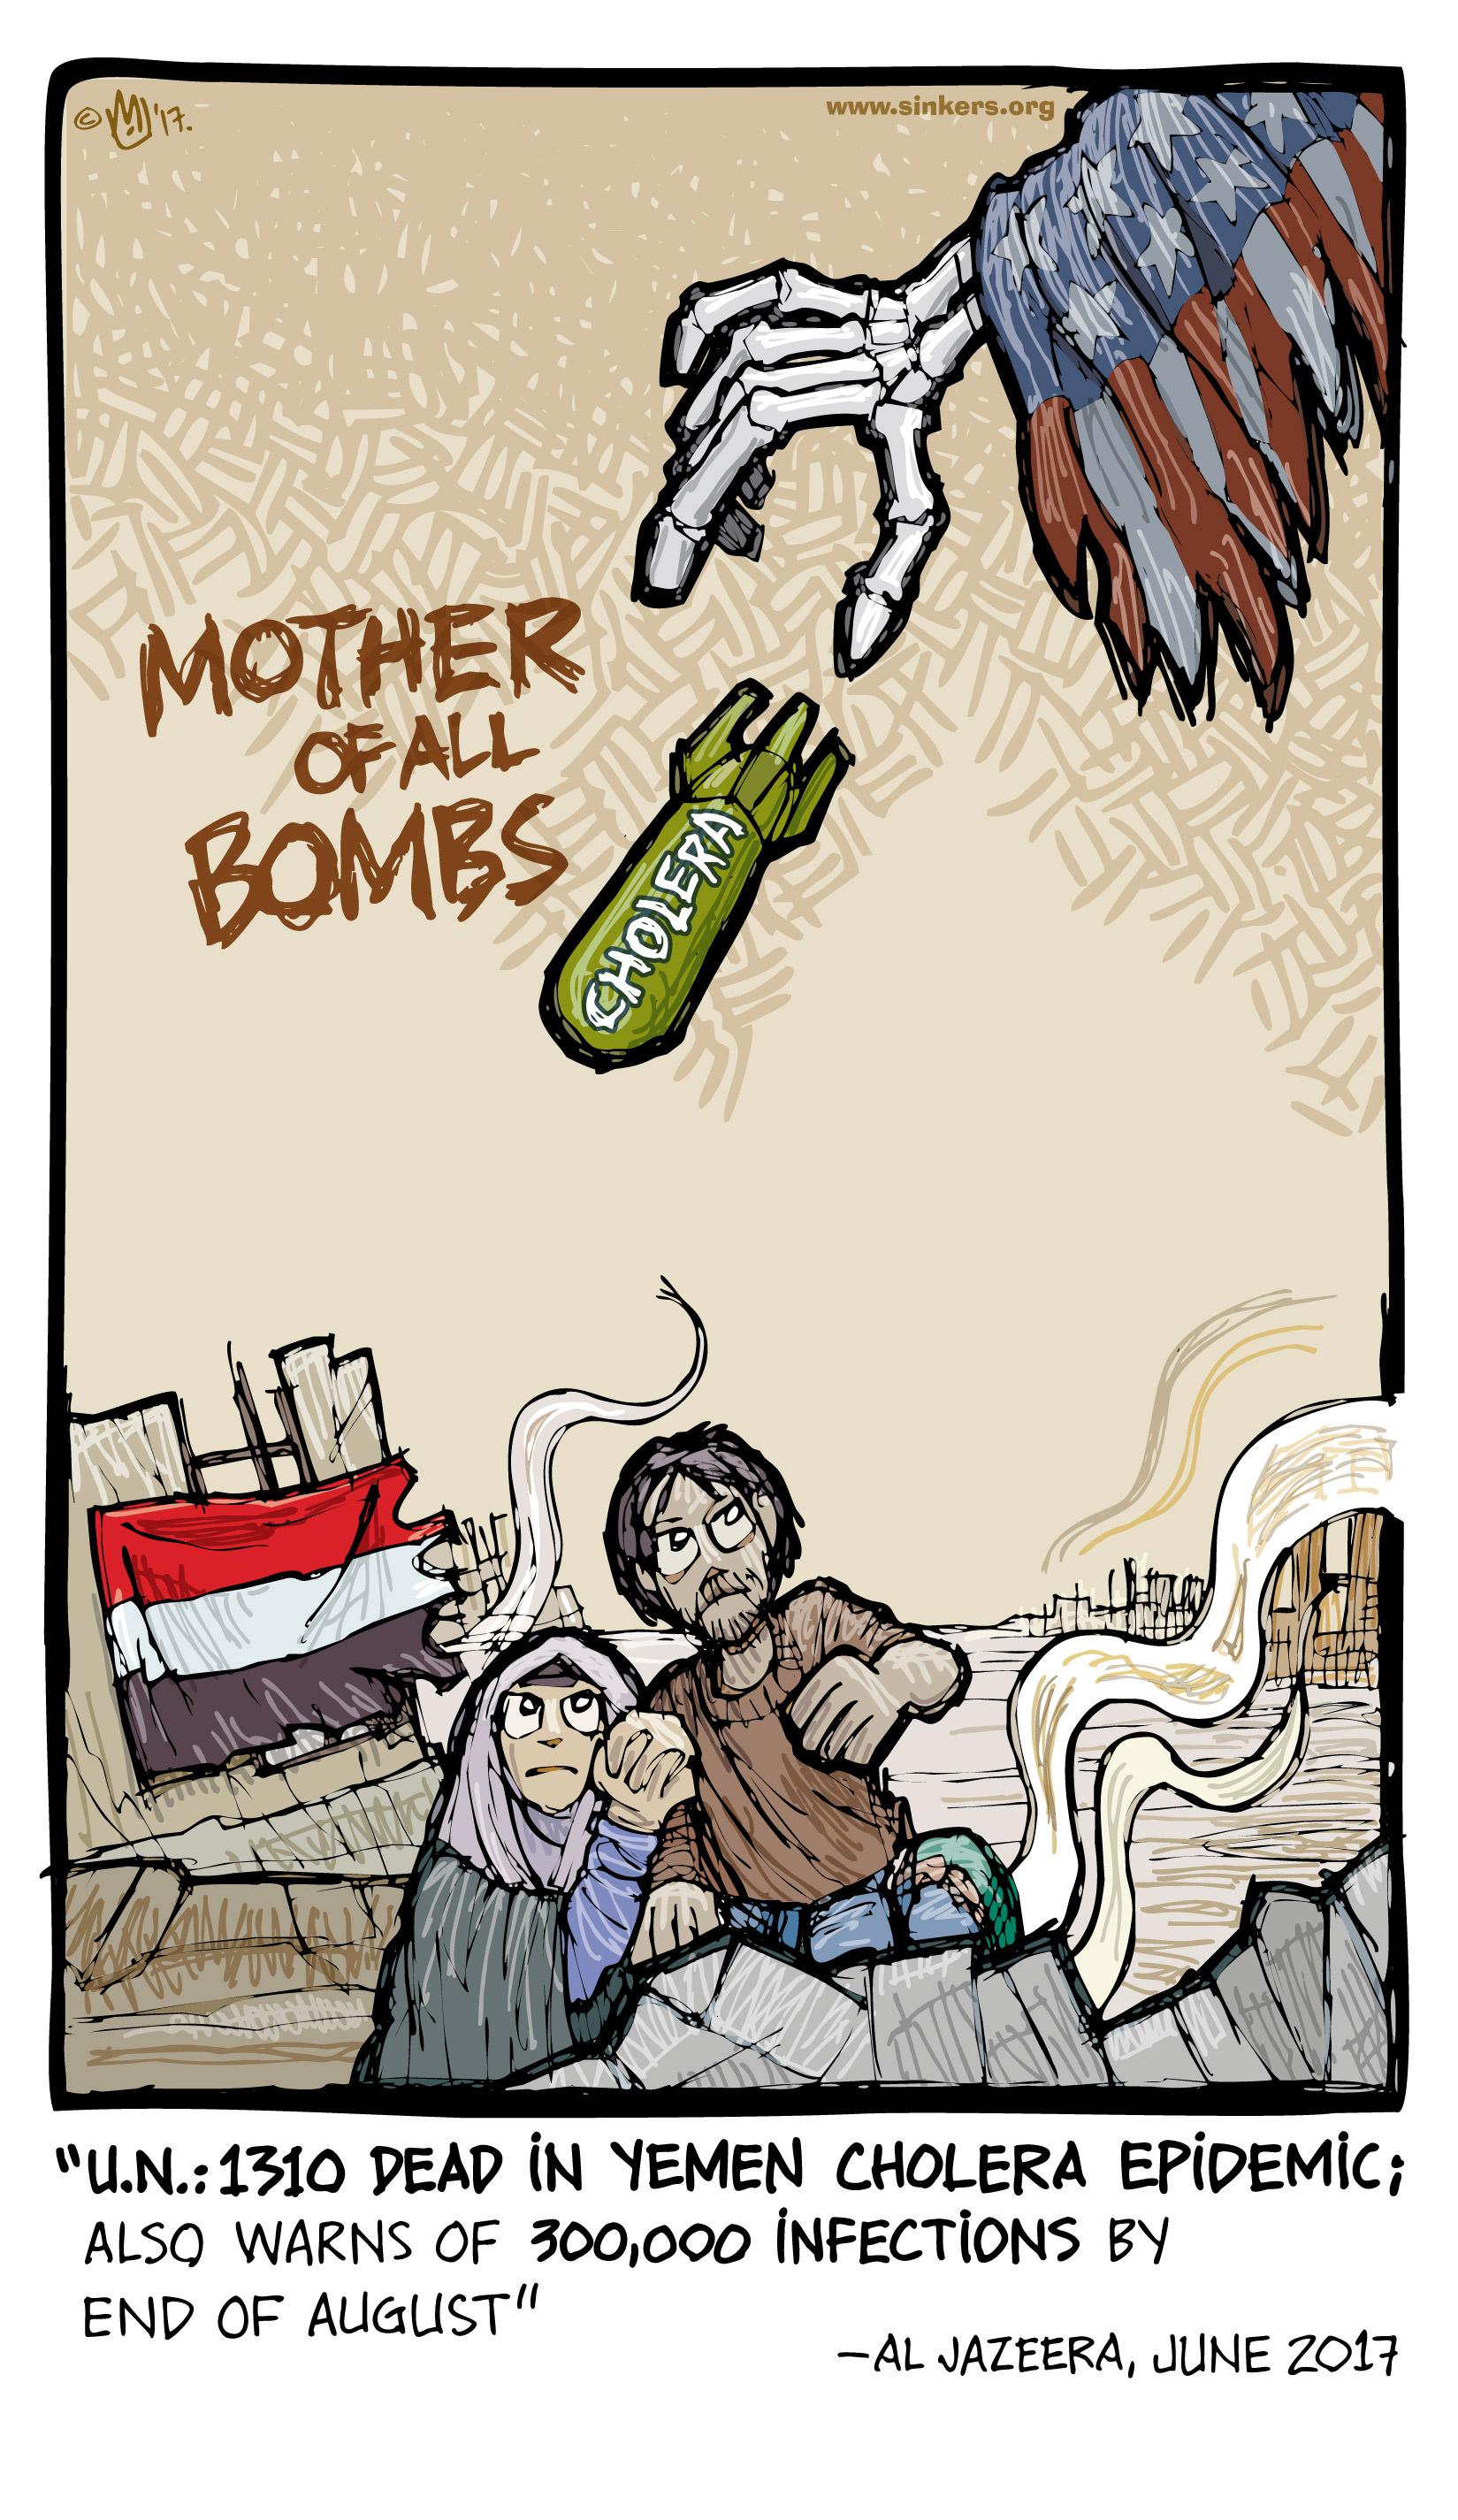 Mike Flugennock Political Cartoons